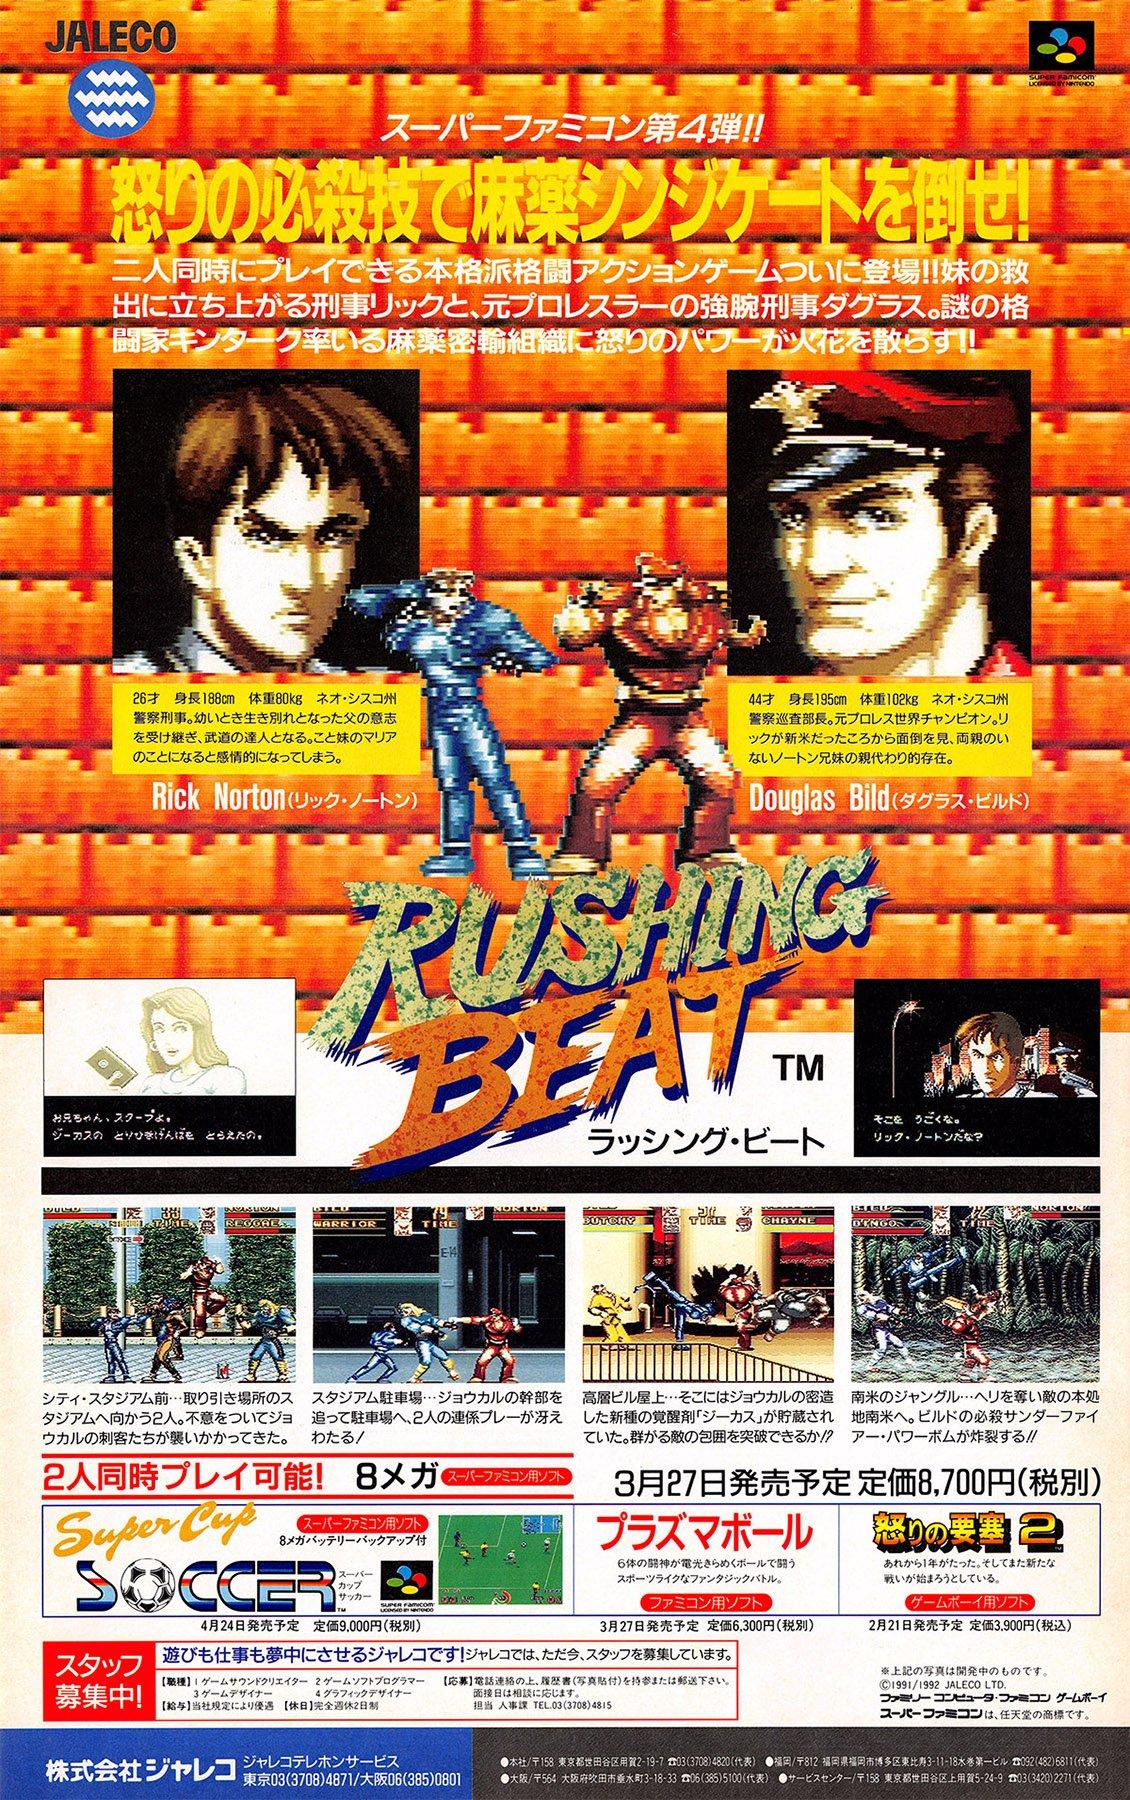 Rival Turf! (Rushing Beat) (Japan) (1)